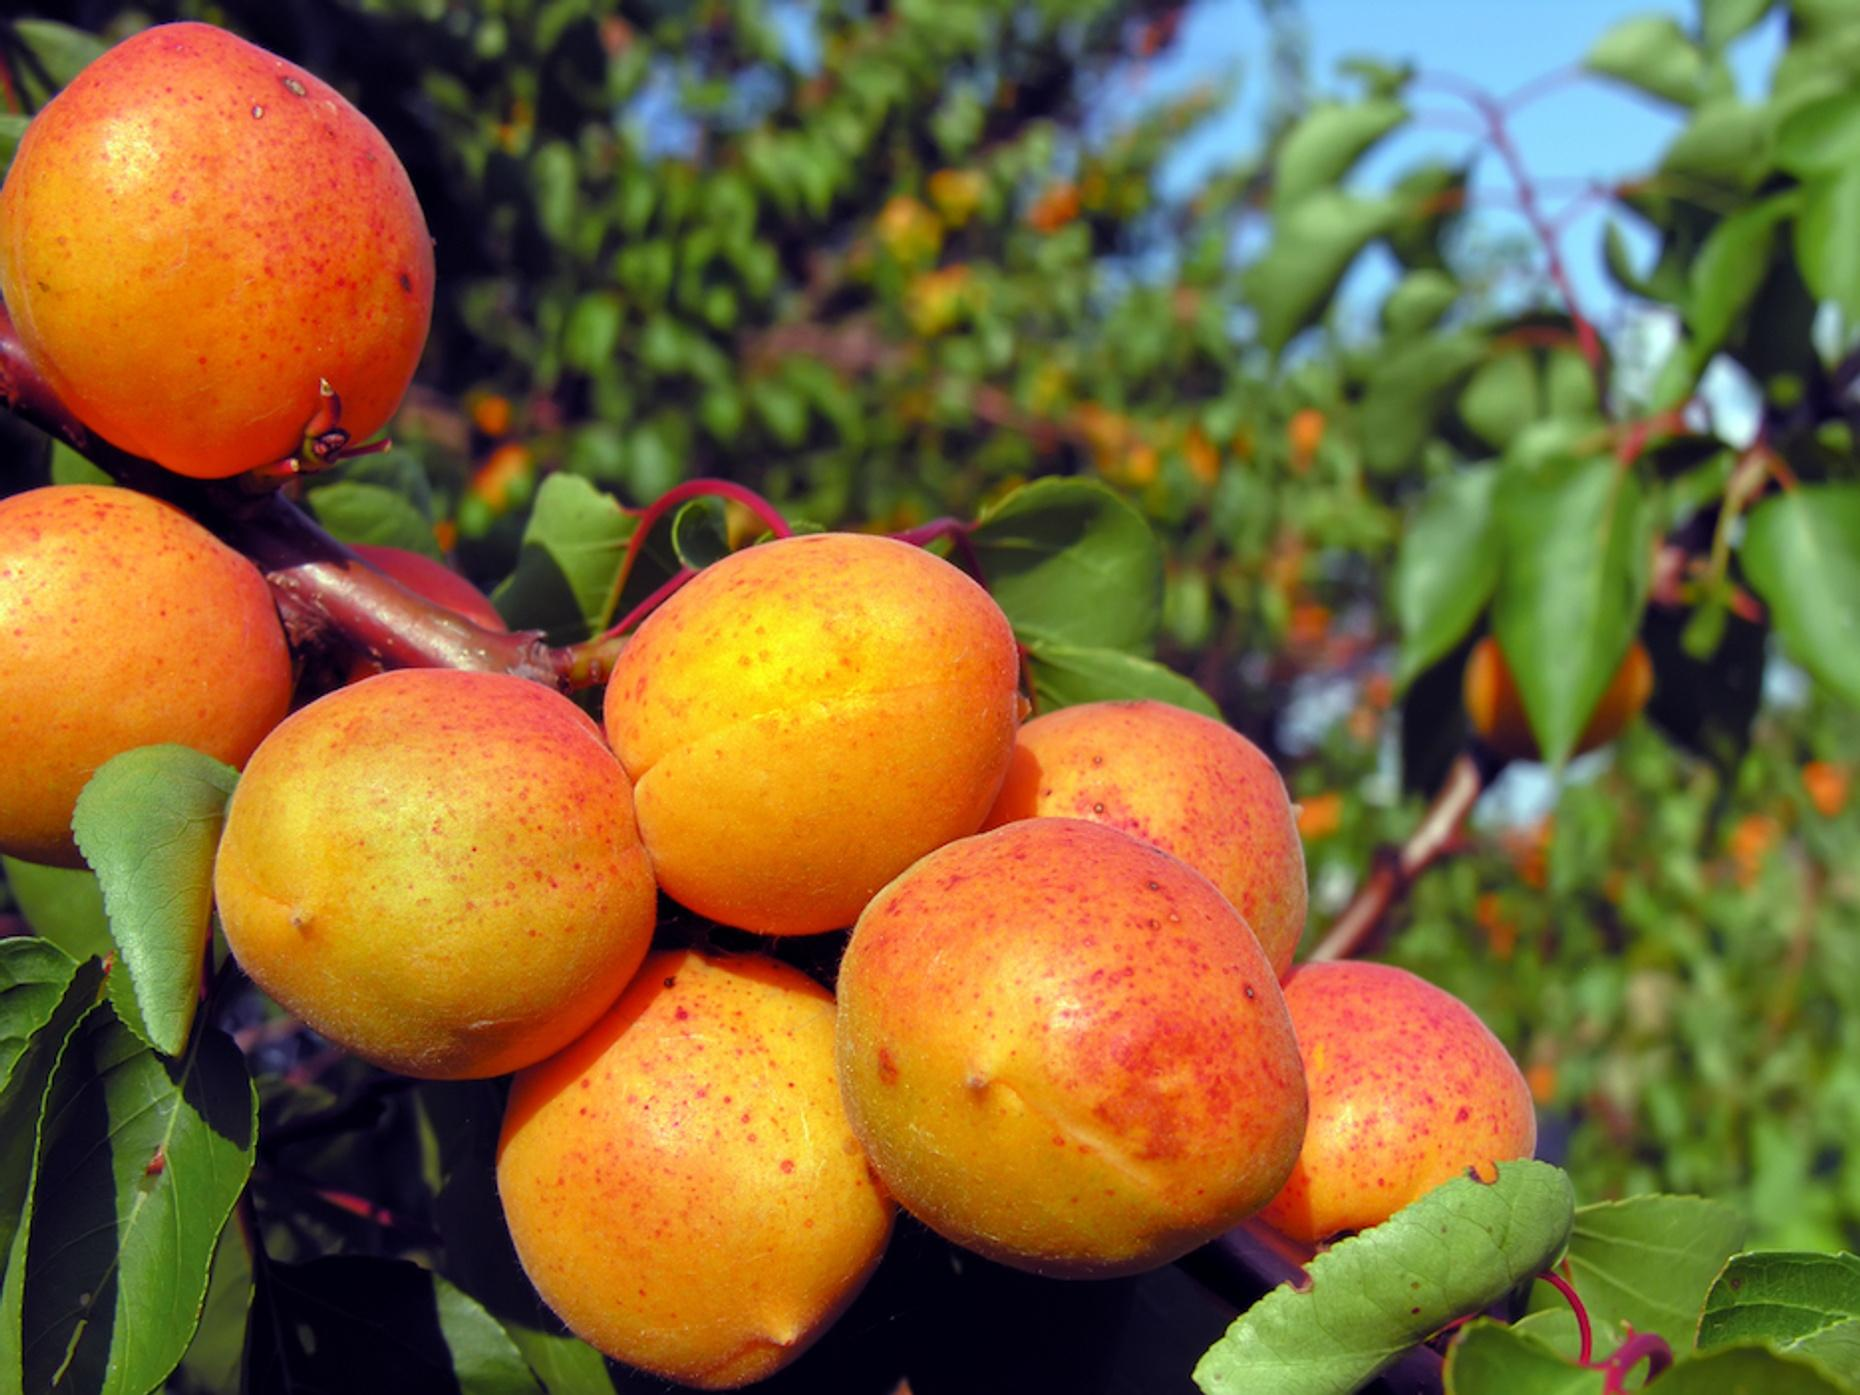 Morgan Hill Local Orchard Tour & Tasting